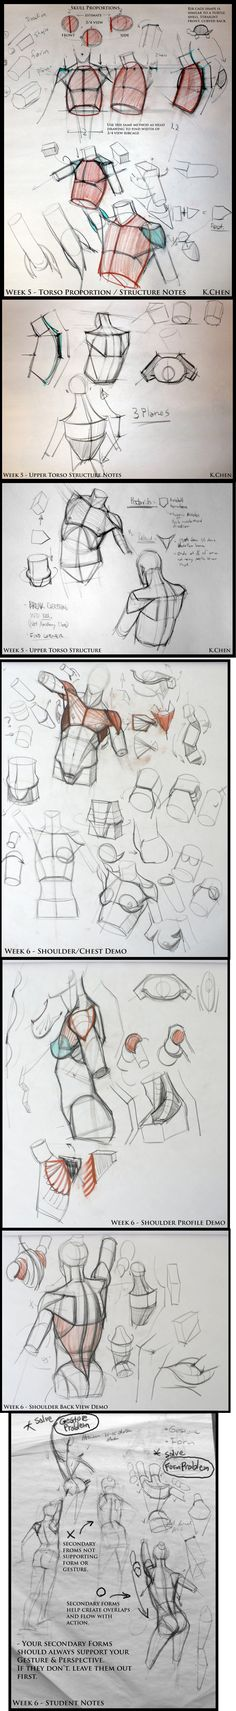 Upper torso / Shoulder & chest structure - analyticalfiguresp08.blogspot - Kevin Chen #analytical #drawing #figureDrawing #instructorDemo #structure